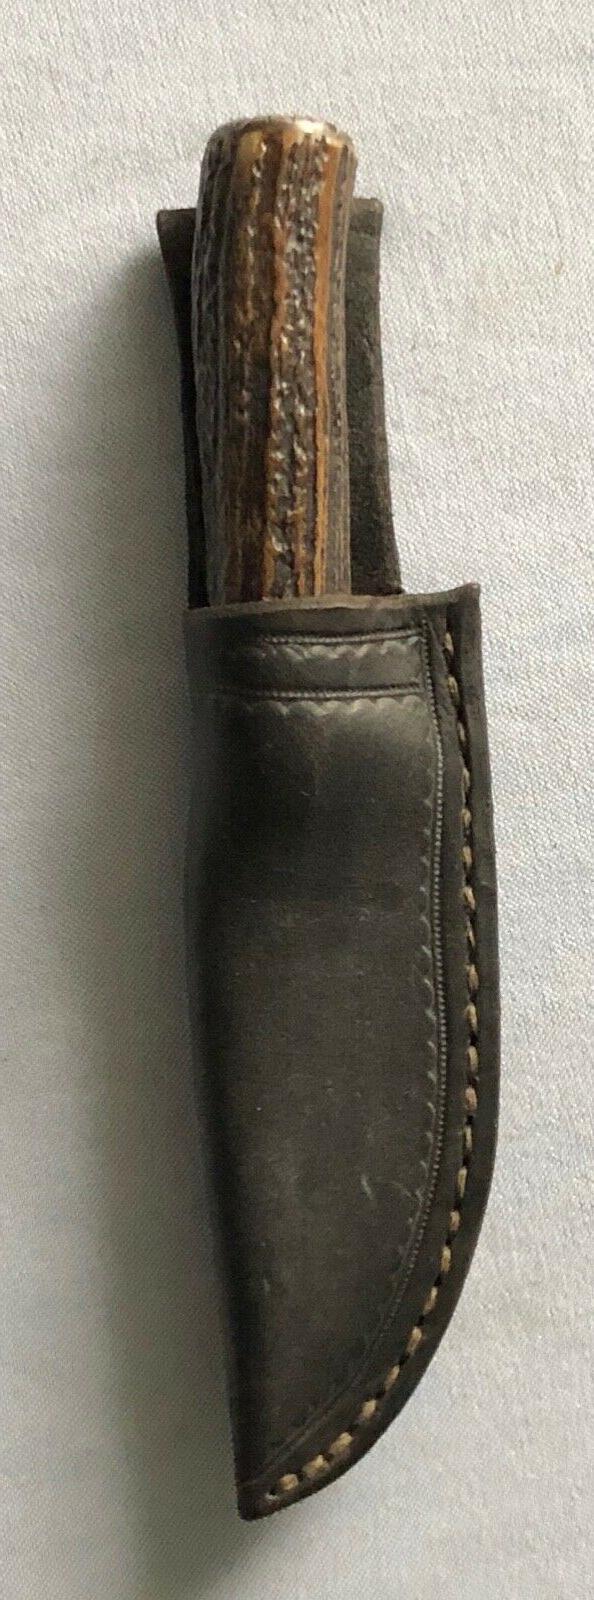 "Tim Ridge SWAMP FOX Drop Point Stag-Hdled 7 3/8"" Belt Knife"